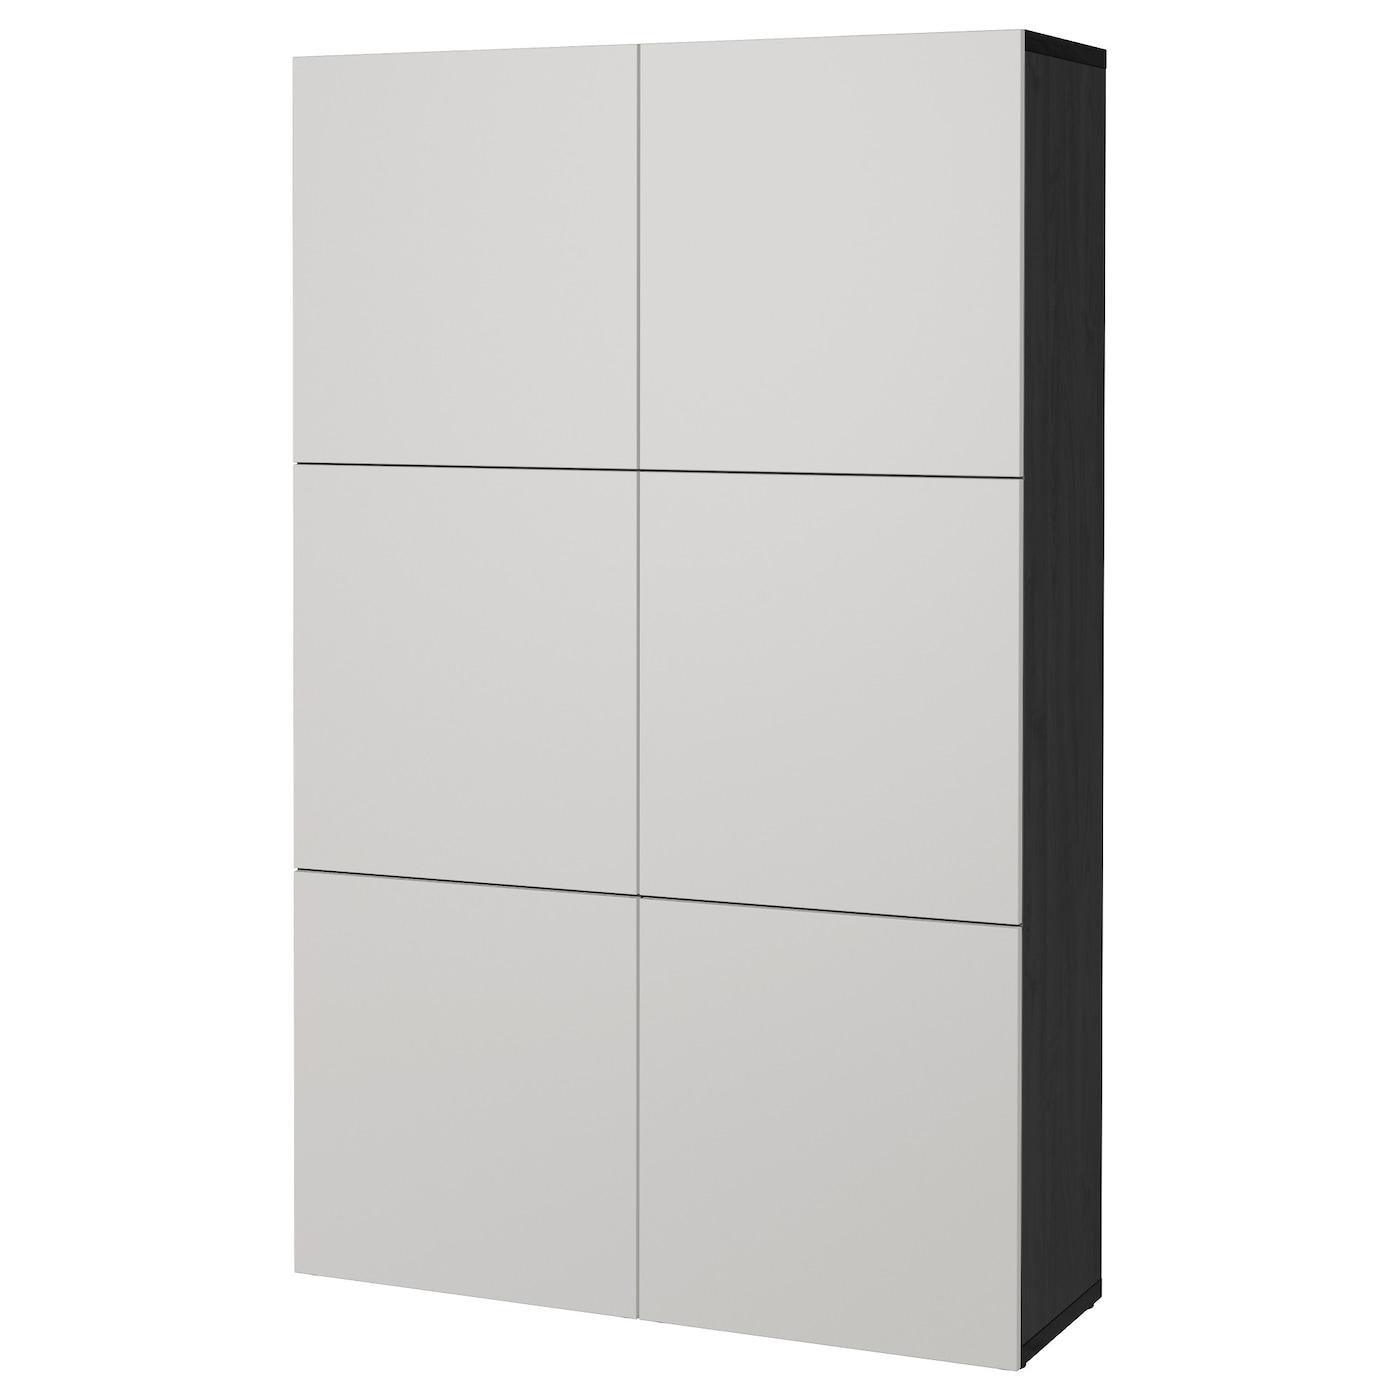 Armadio Metallico Esterno Ikea mobile con ante bestÅ marrone-nero, lappviken grigio chiaro